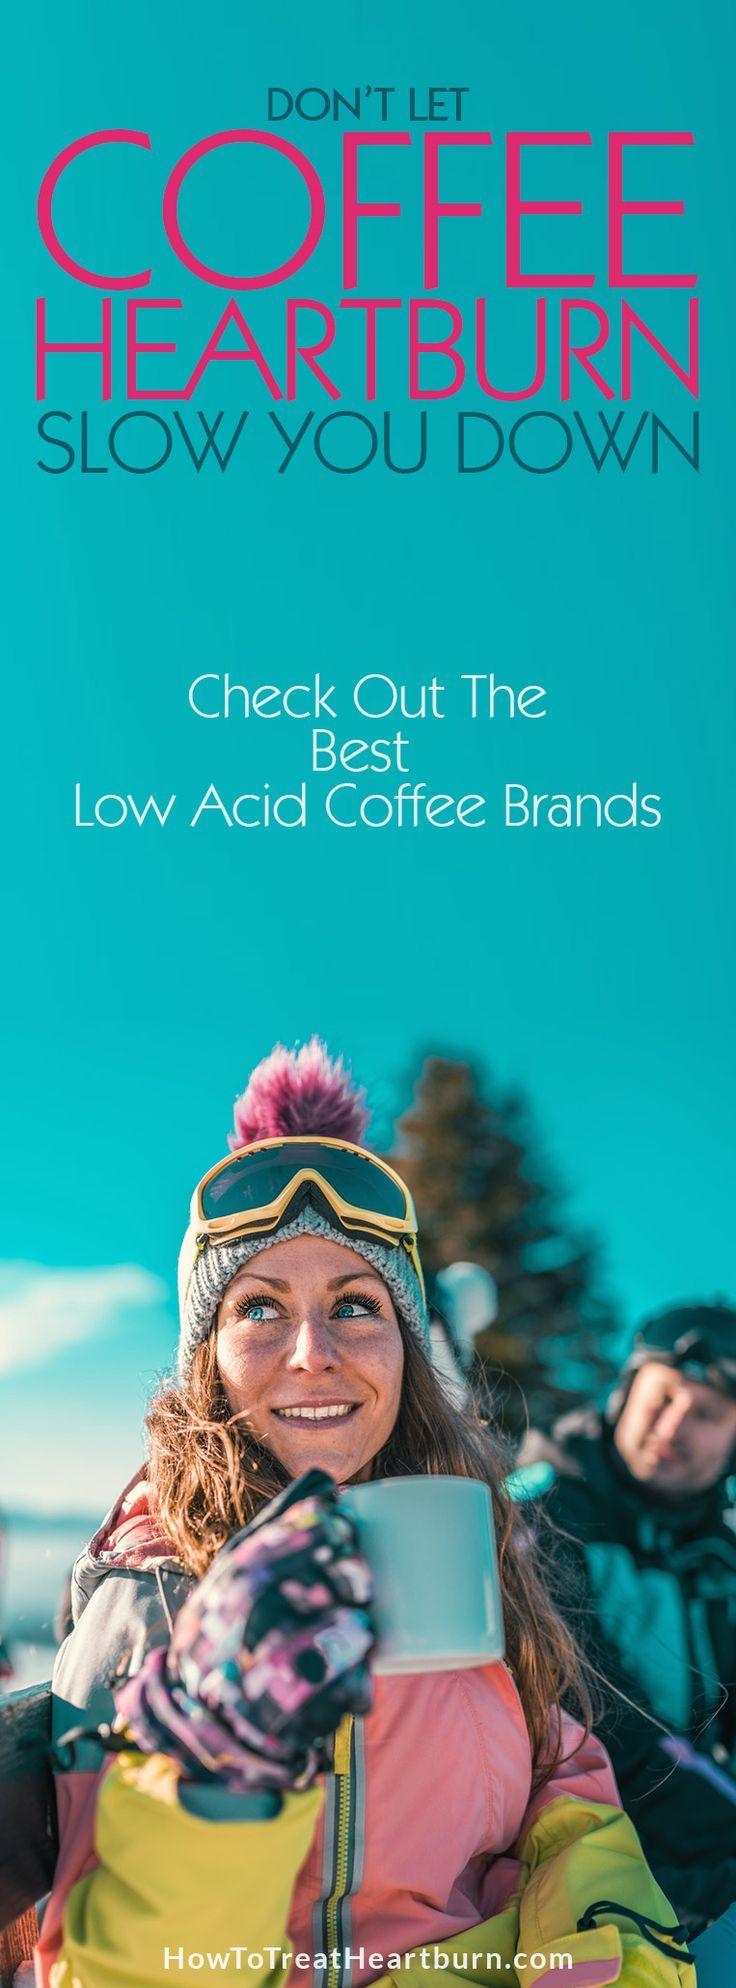 Low Acid Coffee for People with Heartburn and Acid RefluxHow to Treat Heartburn | Steve Hood